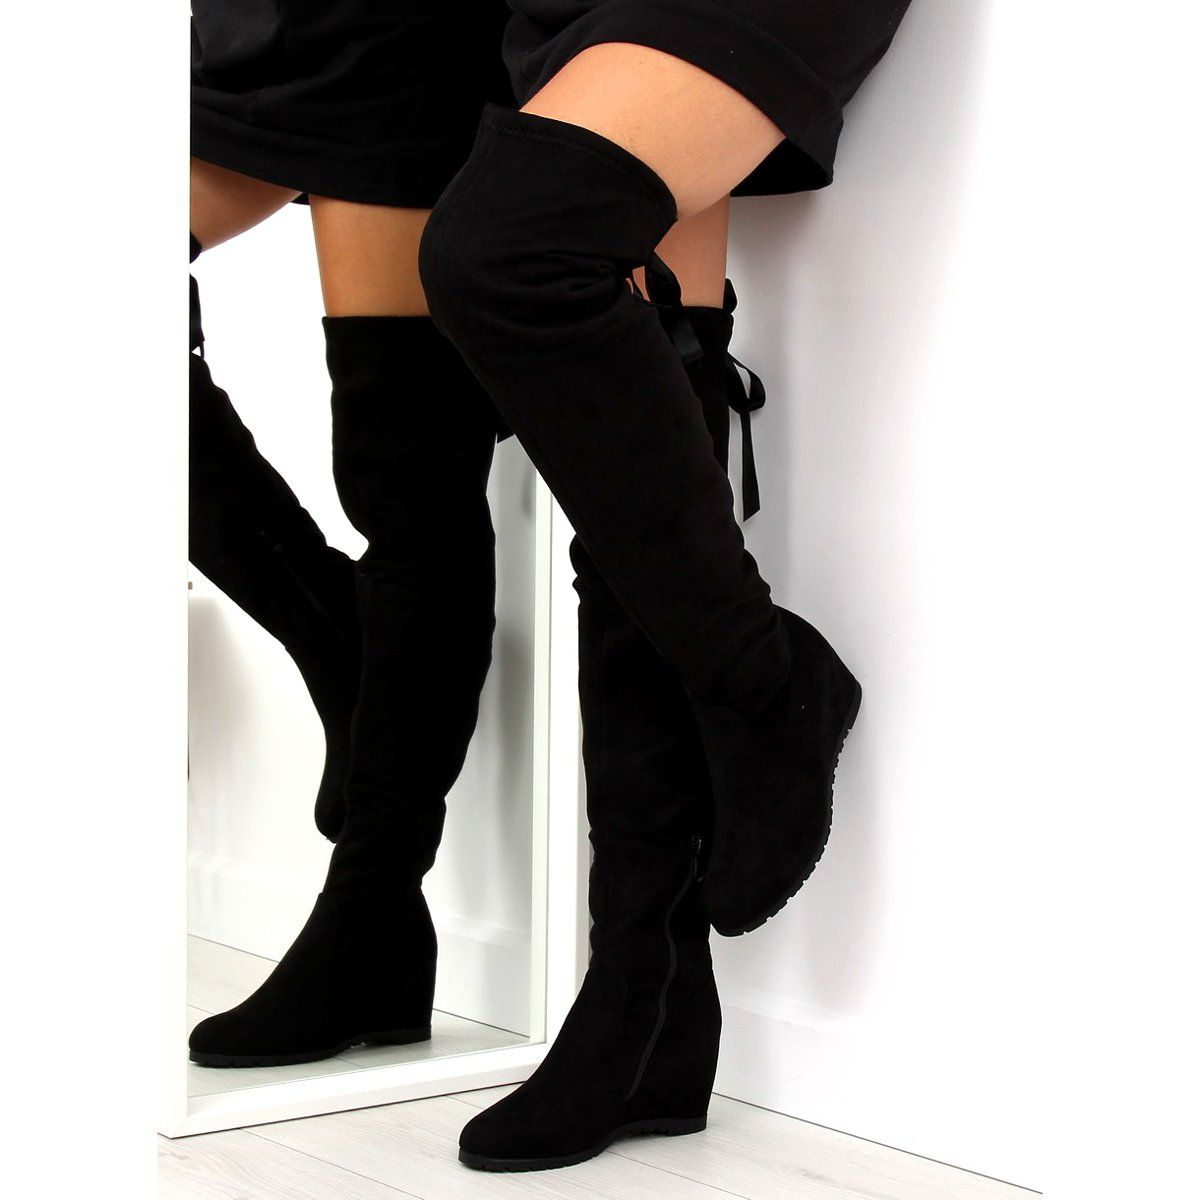 Muszkieterki Na Koturnie Czarne 168 139 Black Over Knee Boot Boots Knee Boots